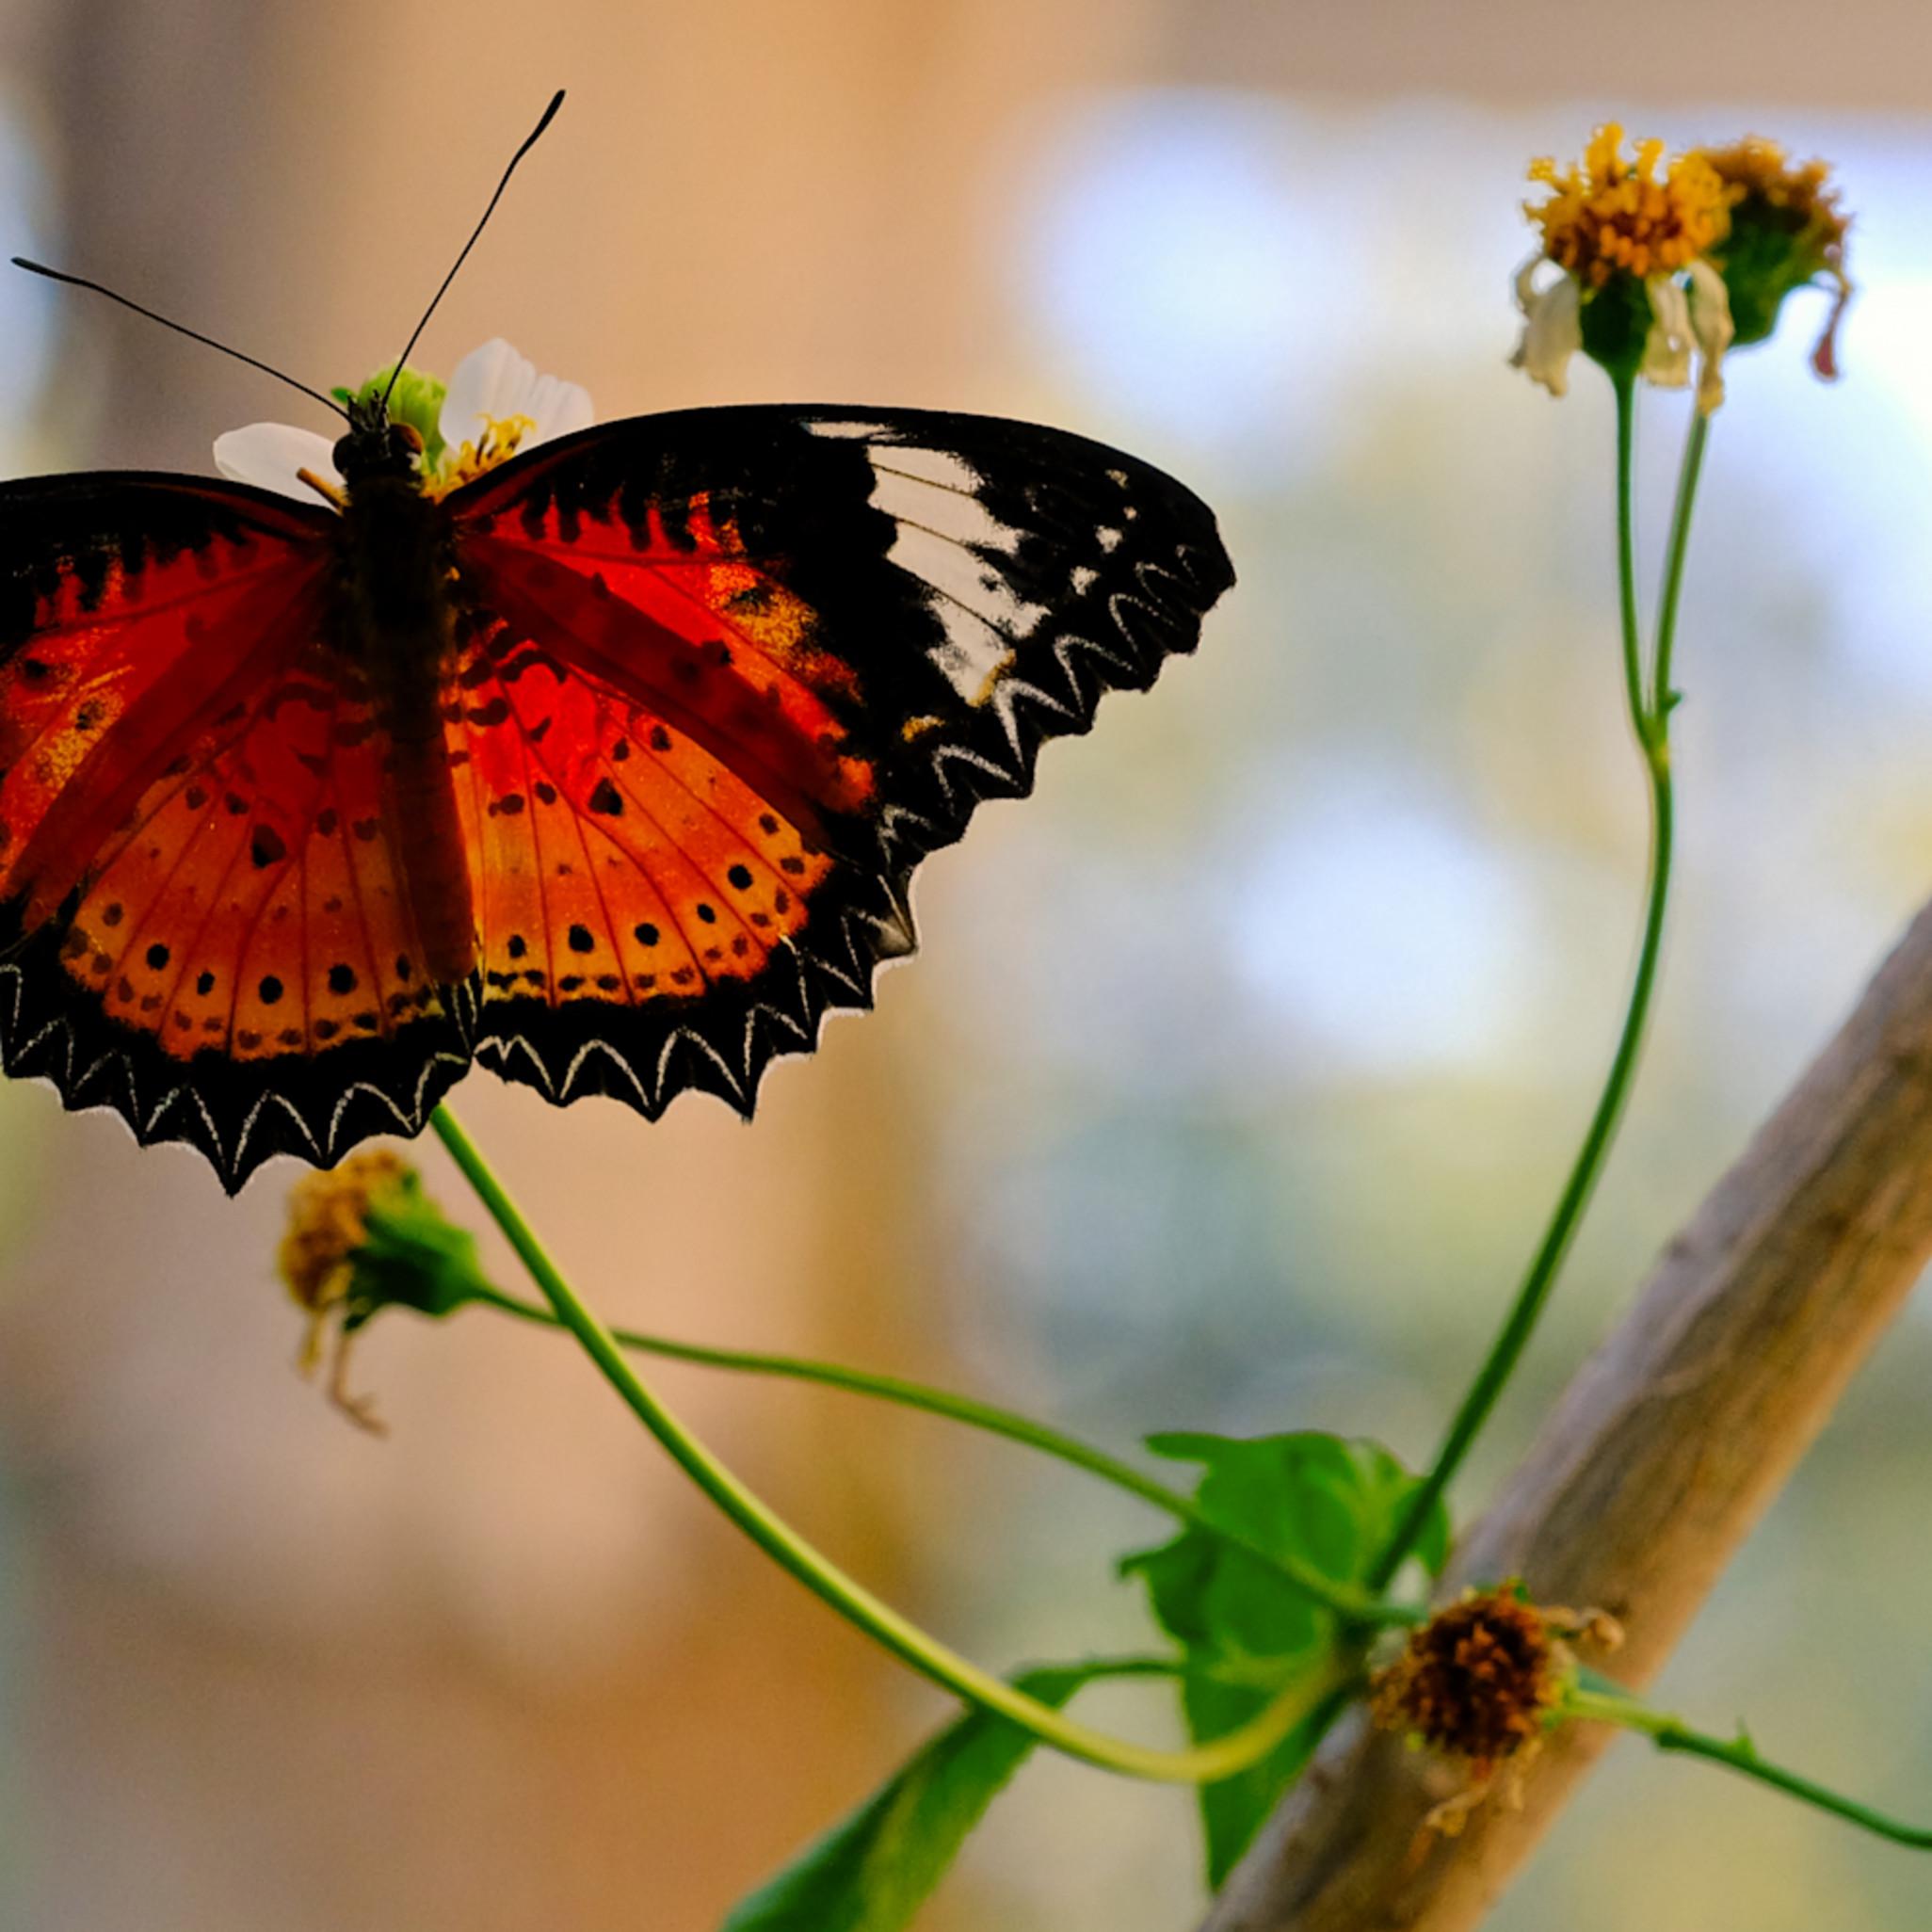 Flowers and butterflies 62 nptjxv